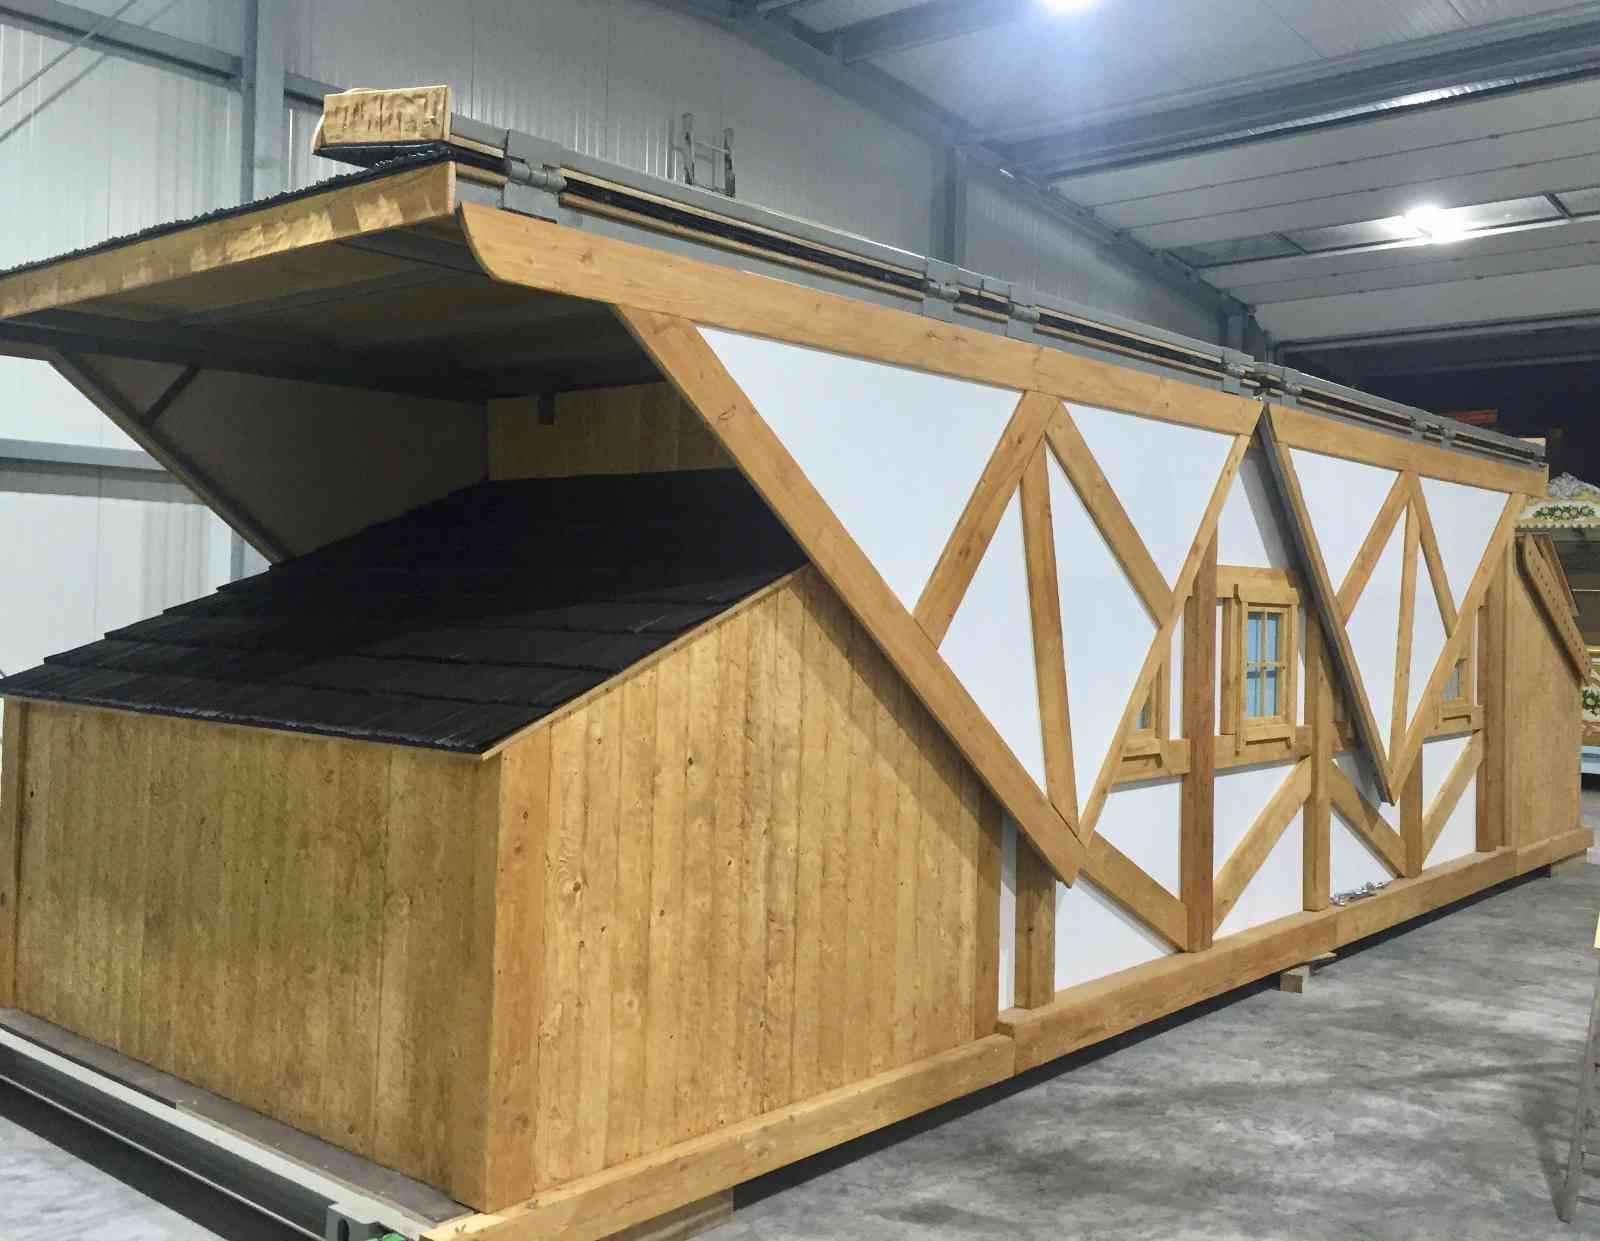 103-Winterstubb Container